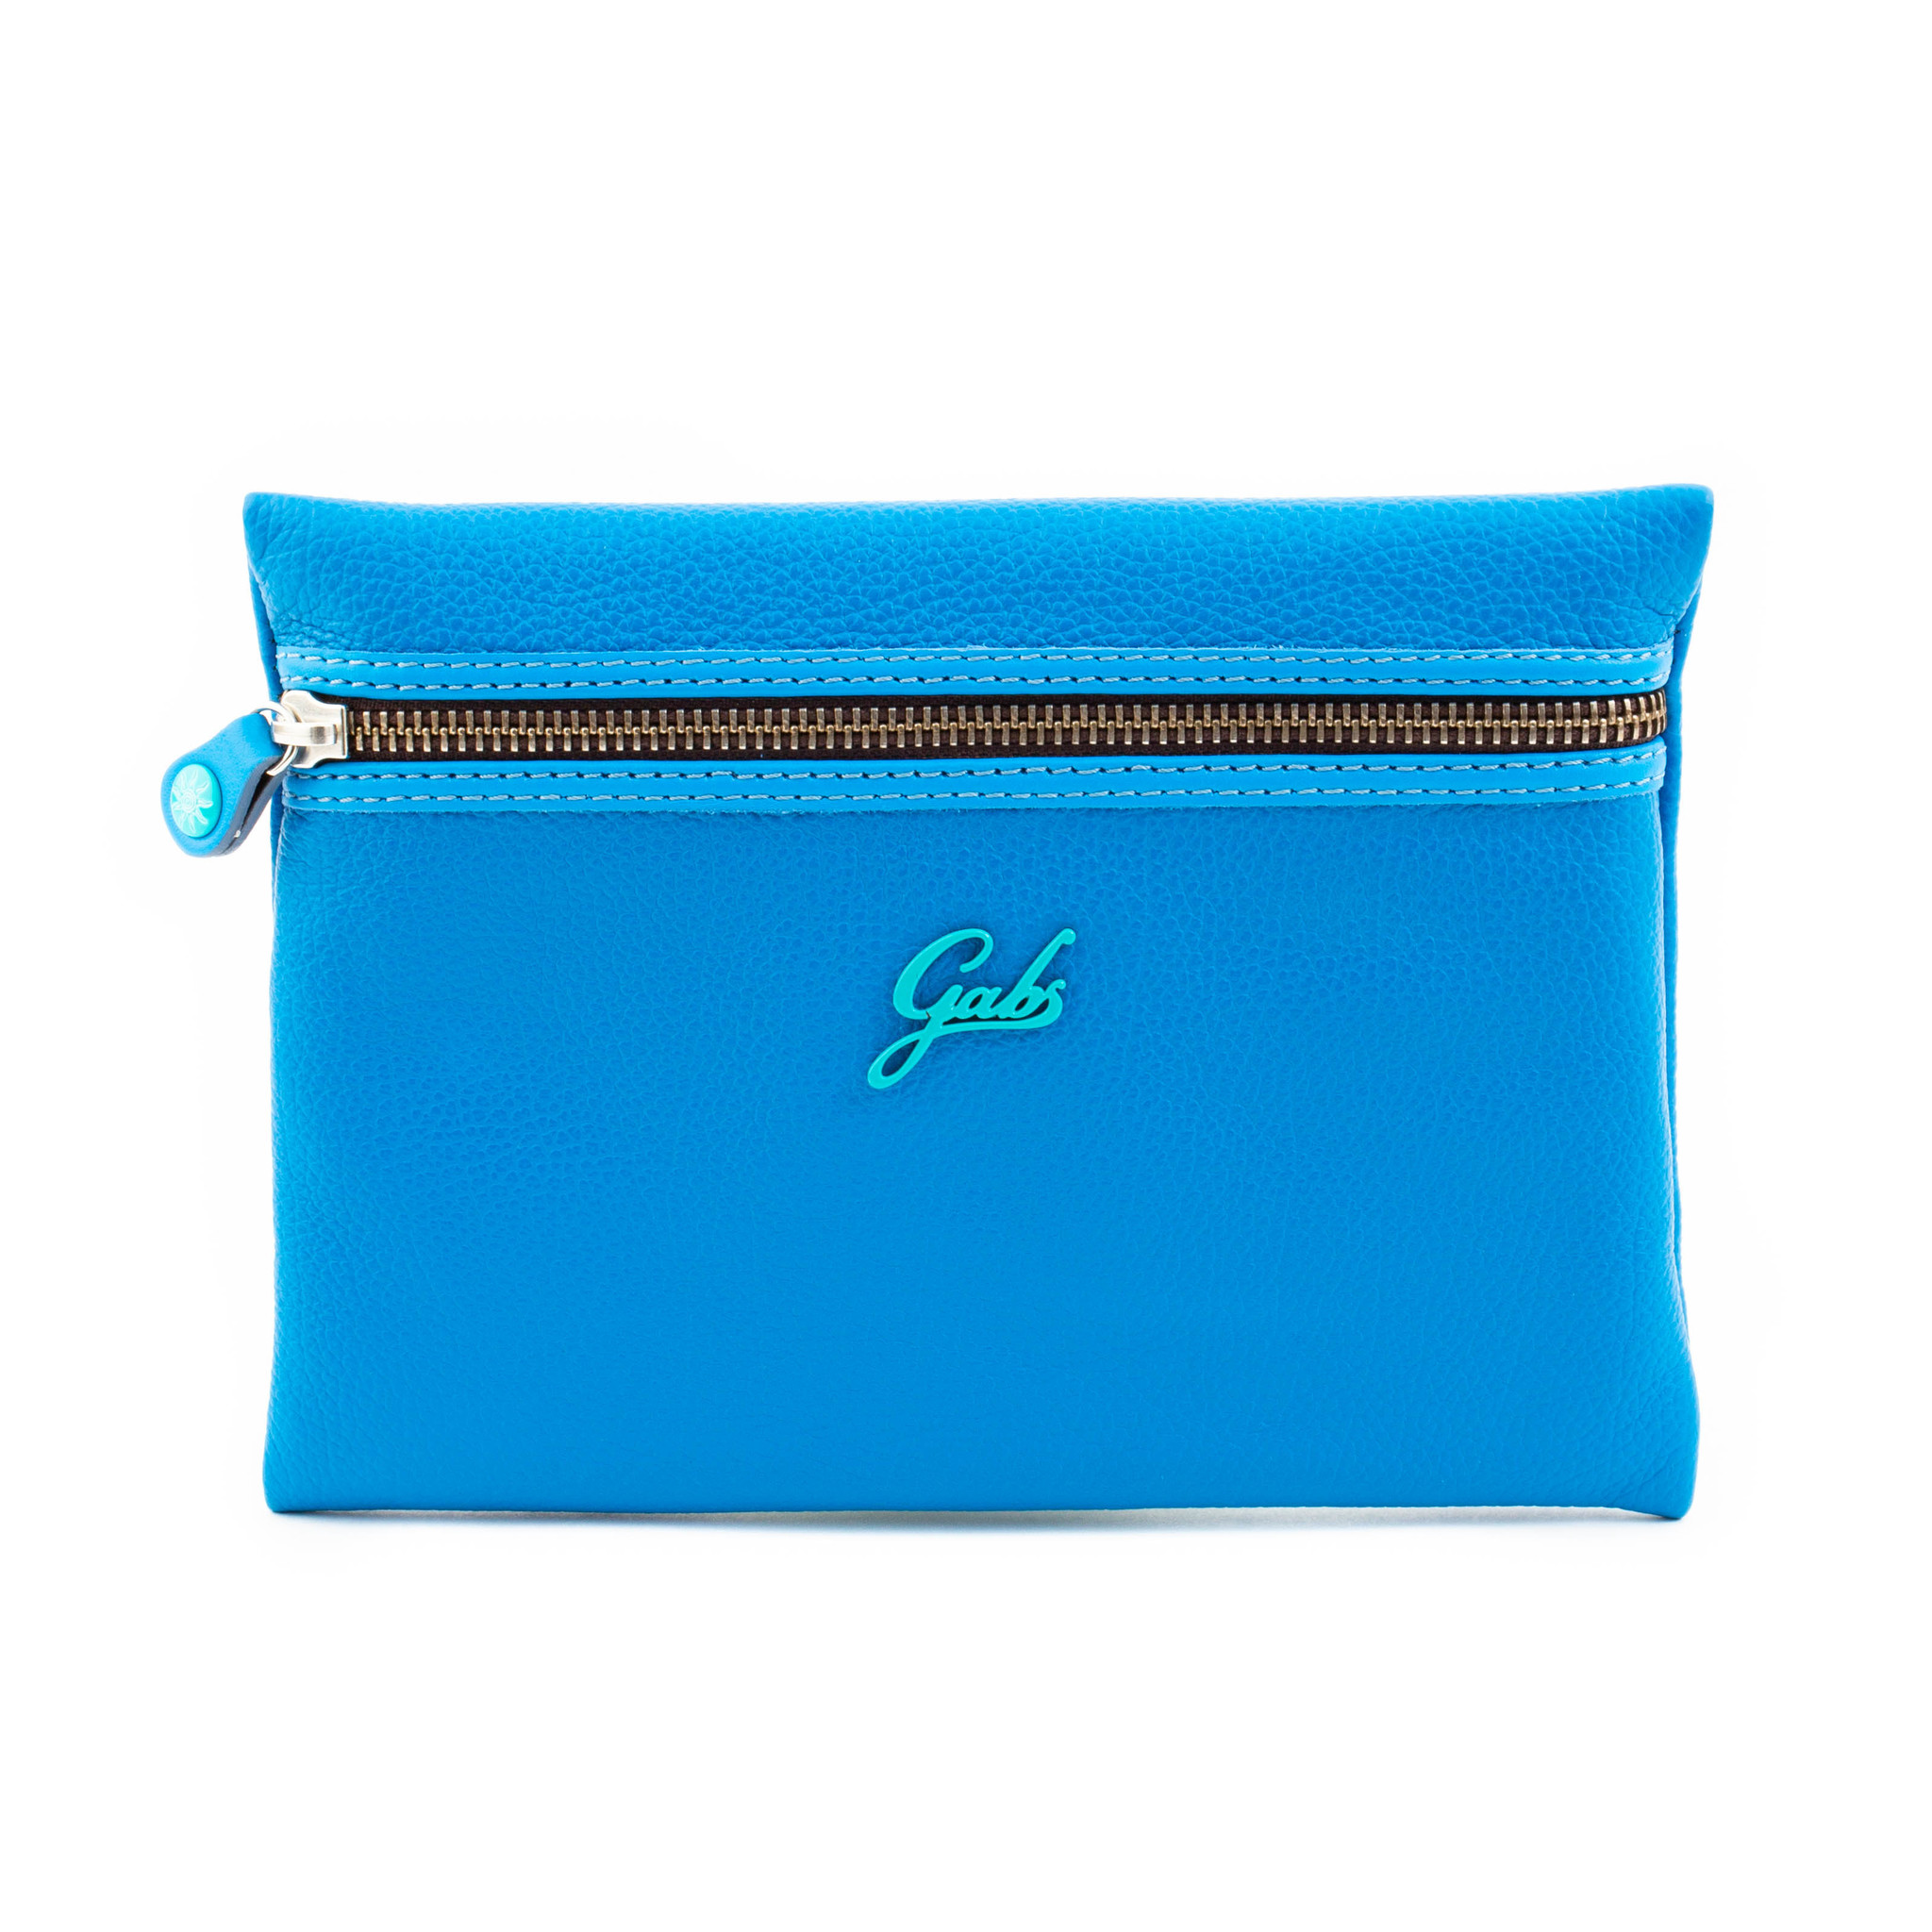 Кожаный клатч Gabs Gpacket Bluette, Italy